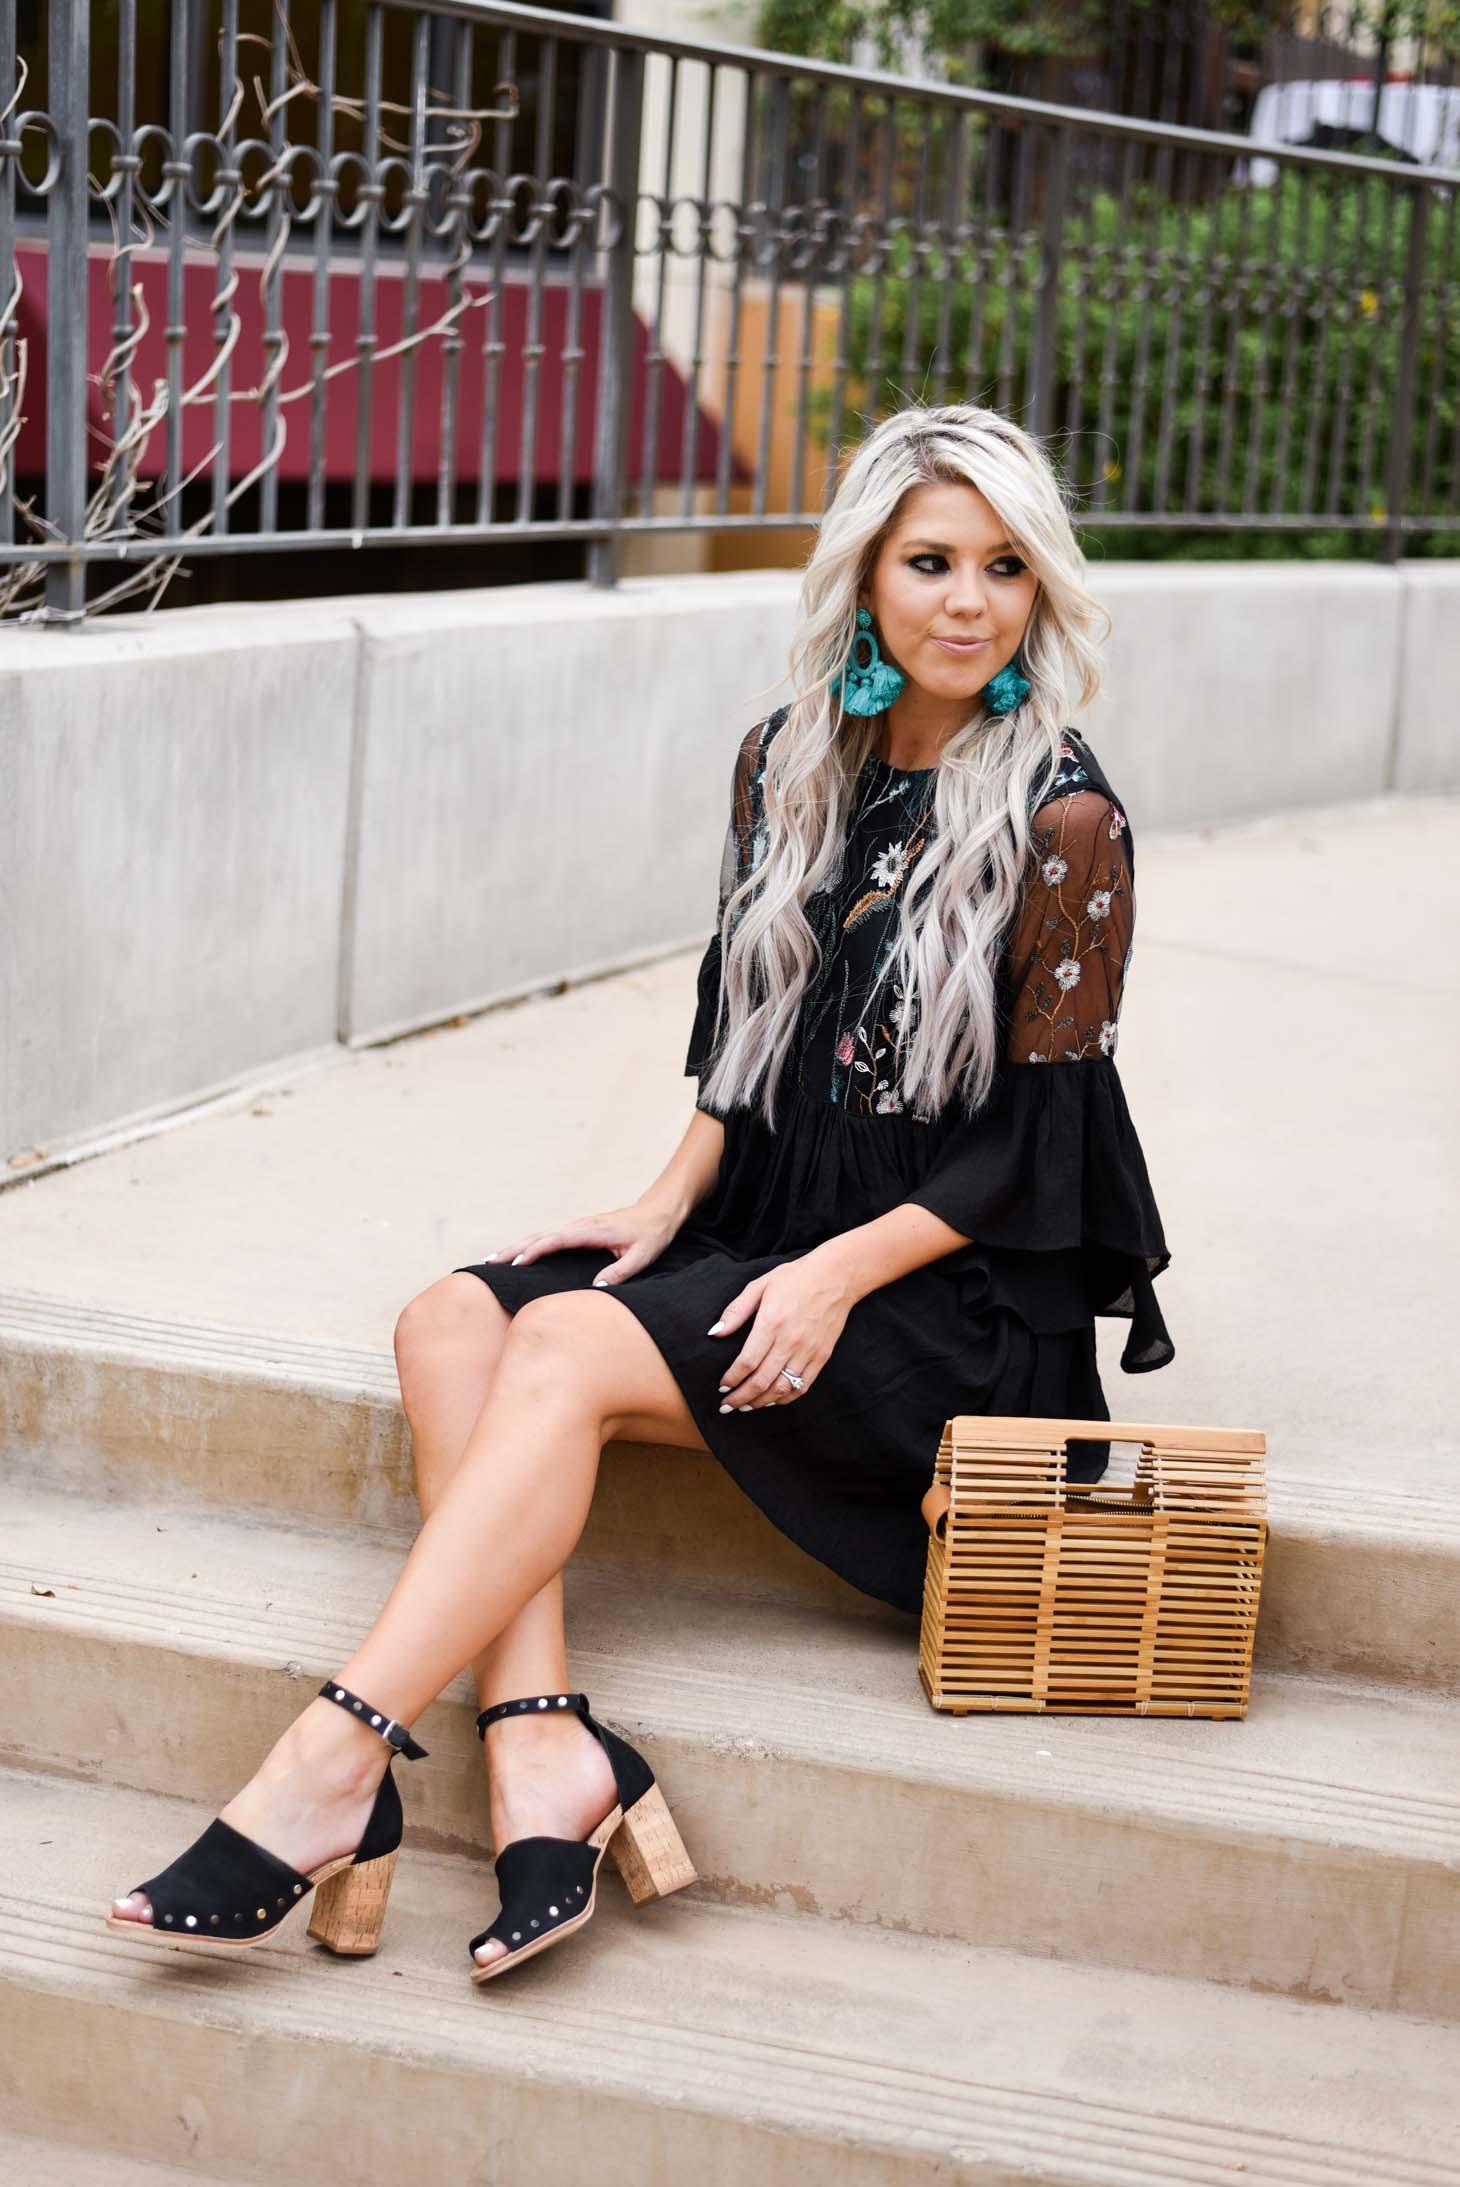 Erin Elizabeth of Wink and a Twirl shares the cutest Fall dress by Jillian Landry Designs